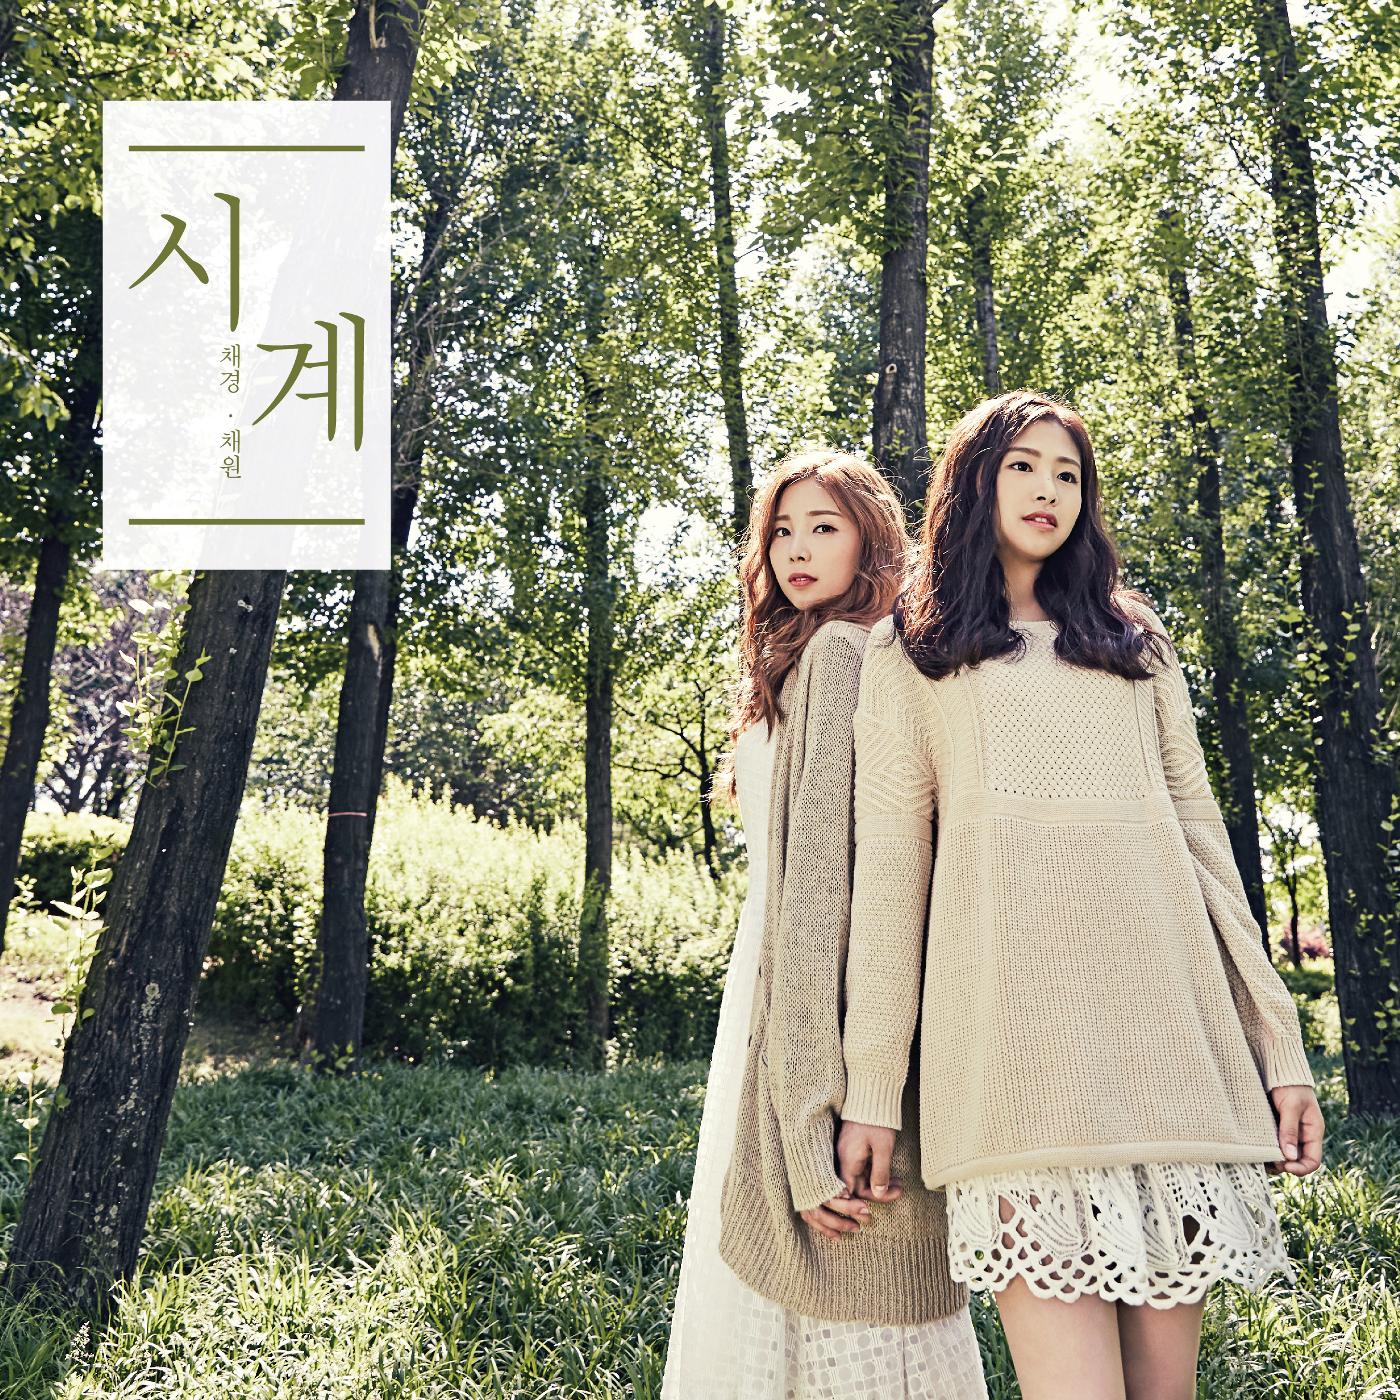 Clock (Chaewon & Chaekyung)